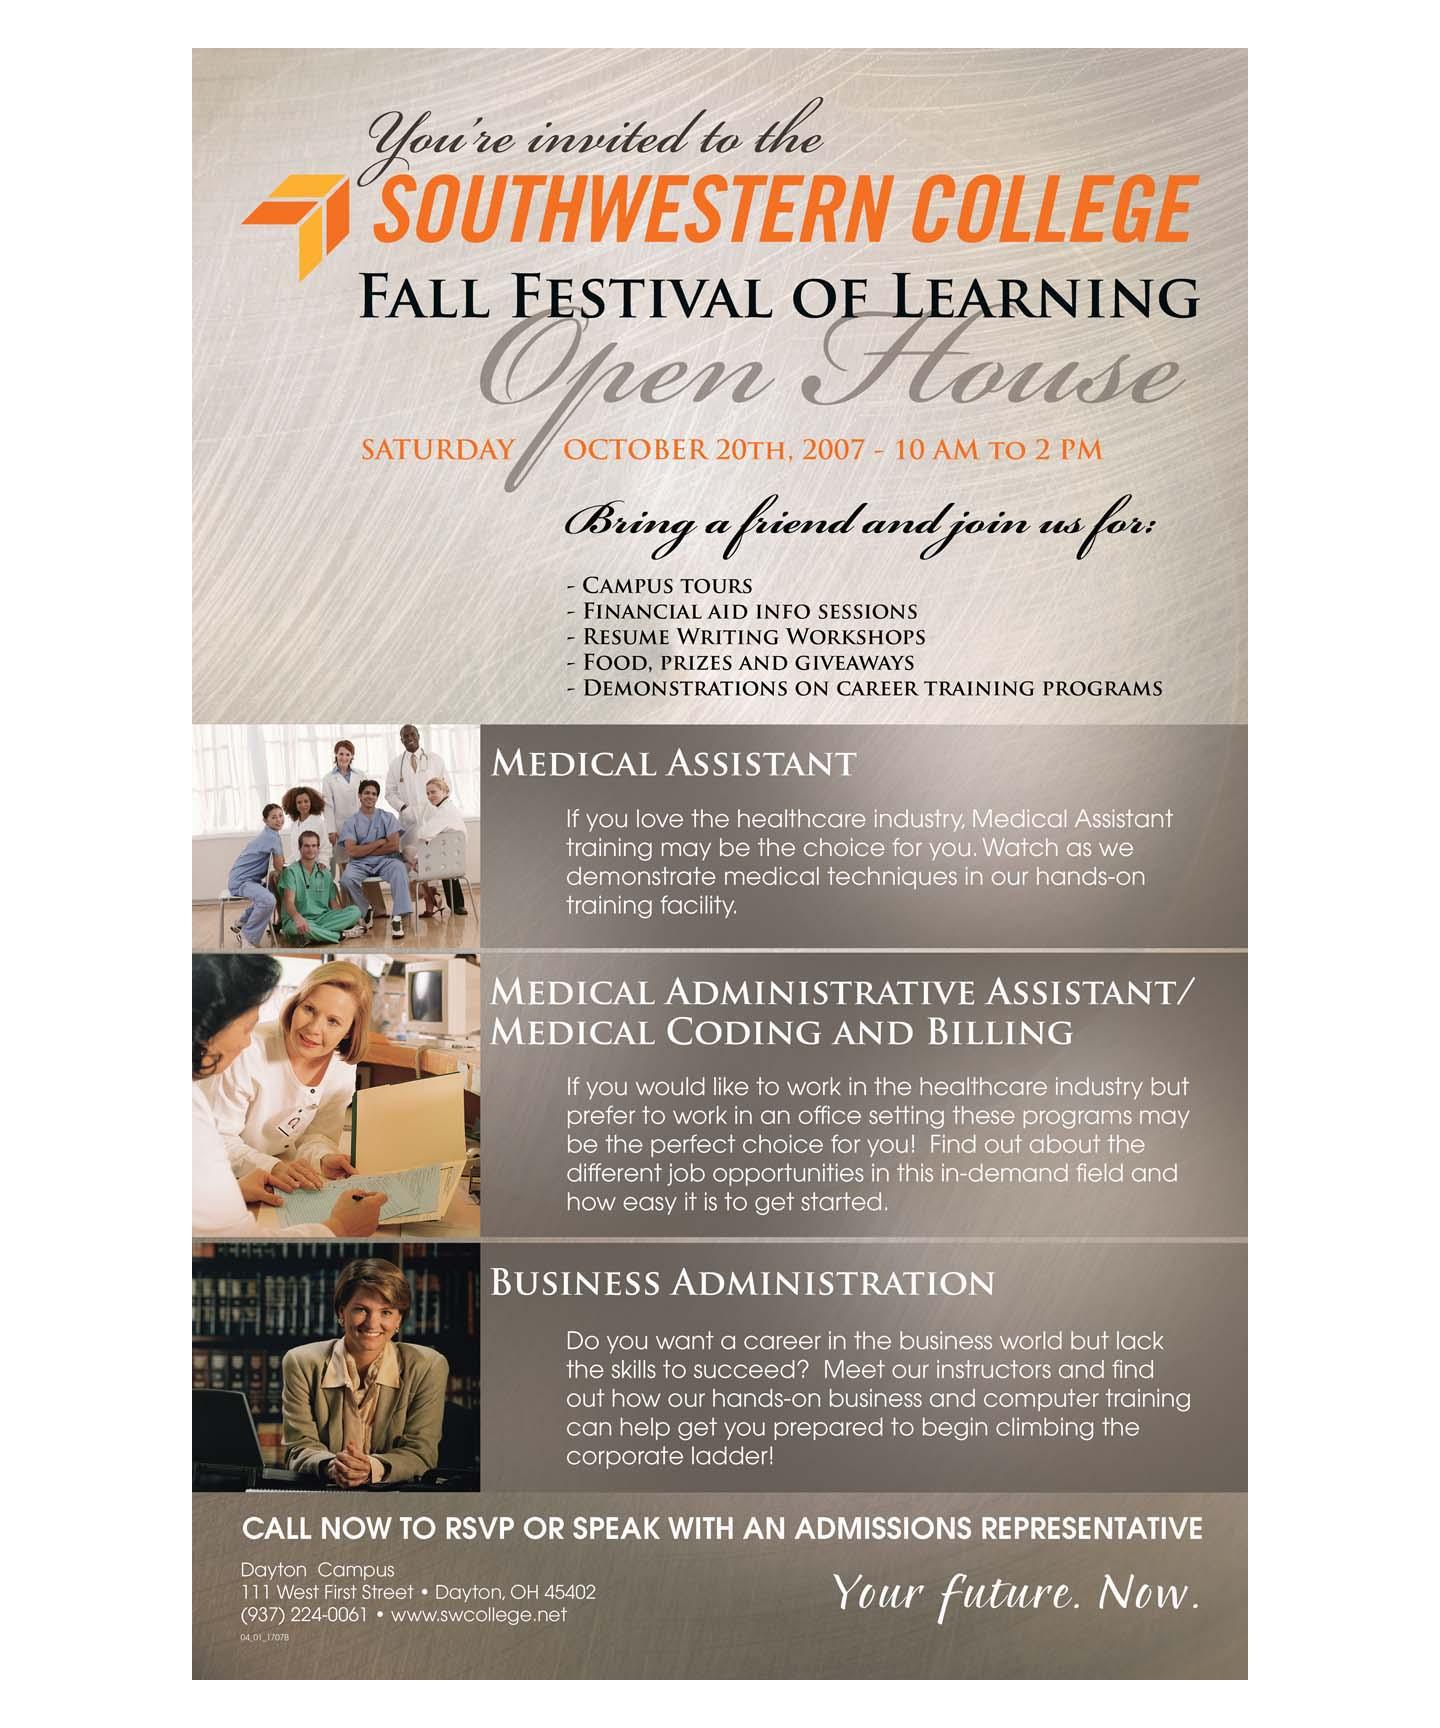 LTI_Invite_FL Dayton Campus_LR.jpg